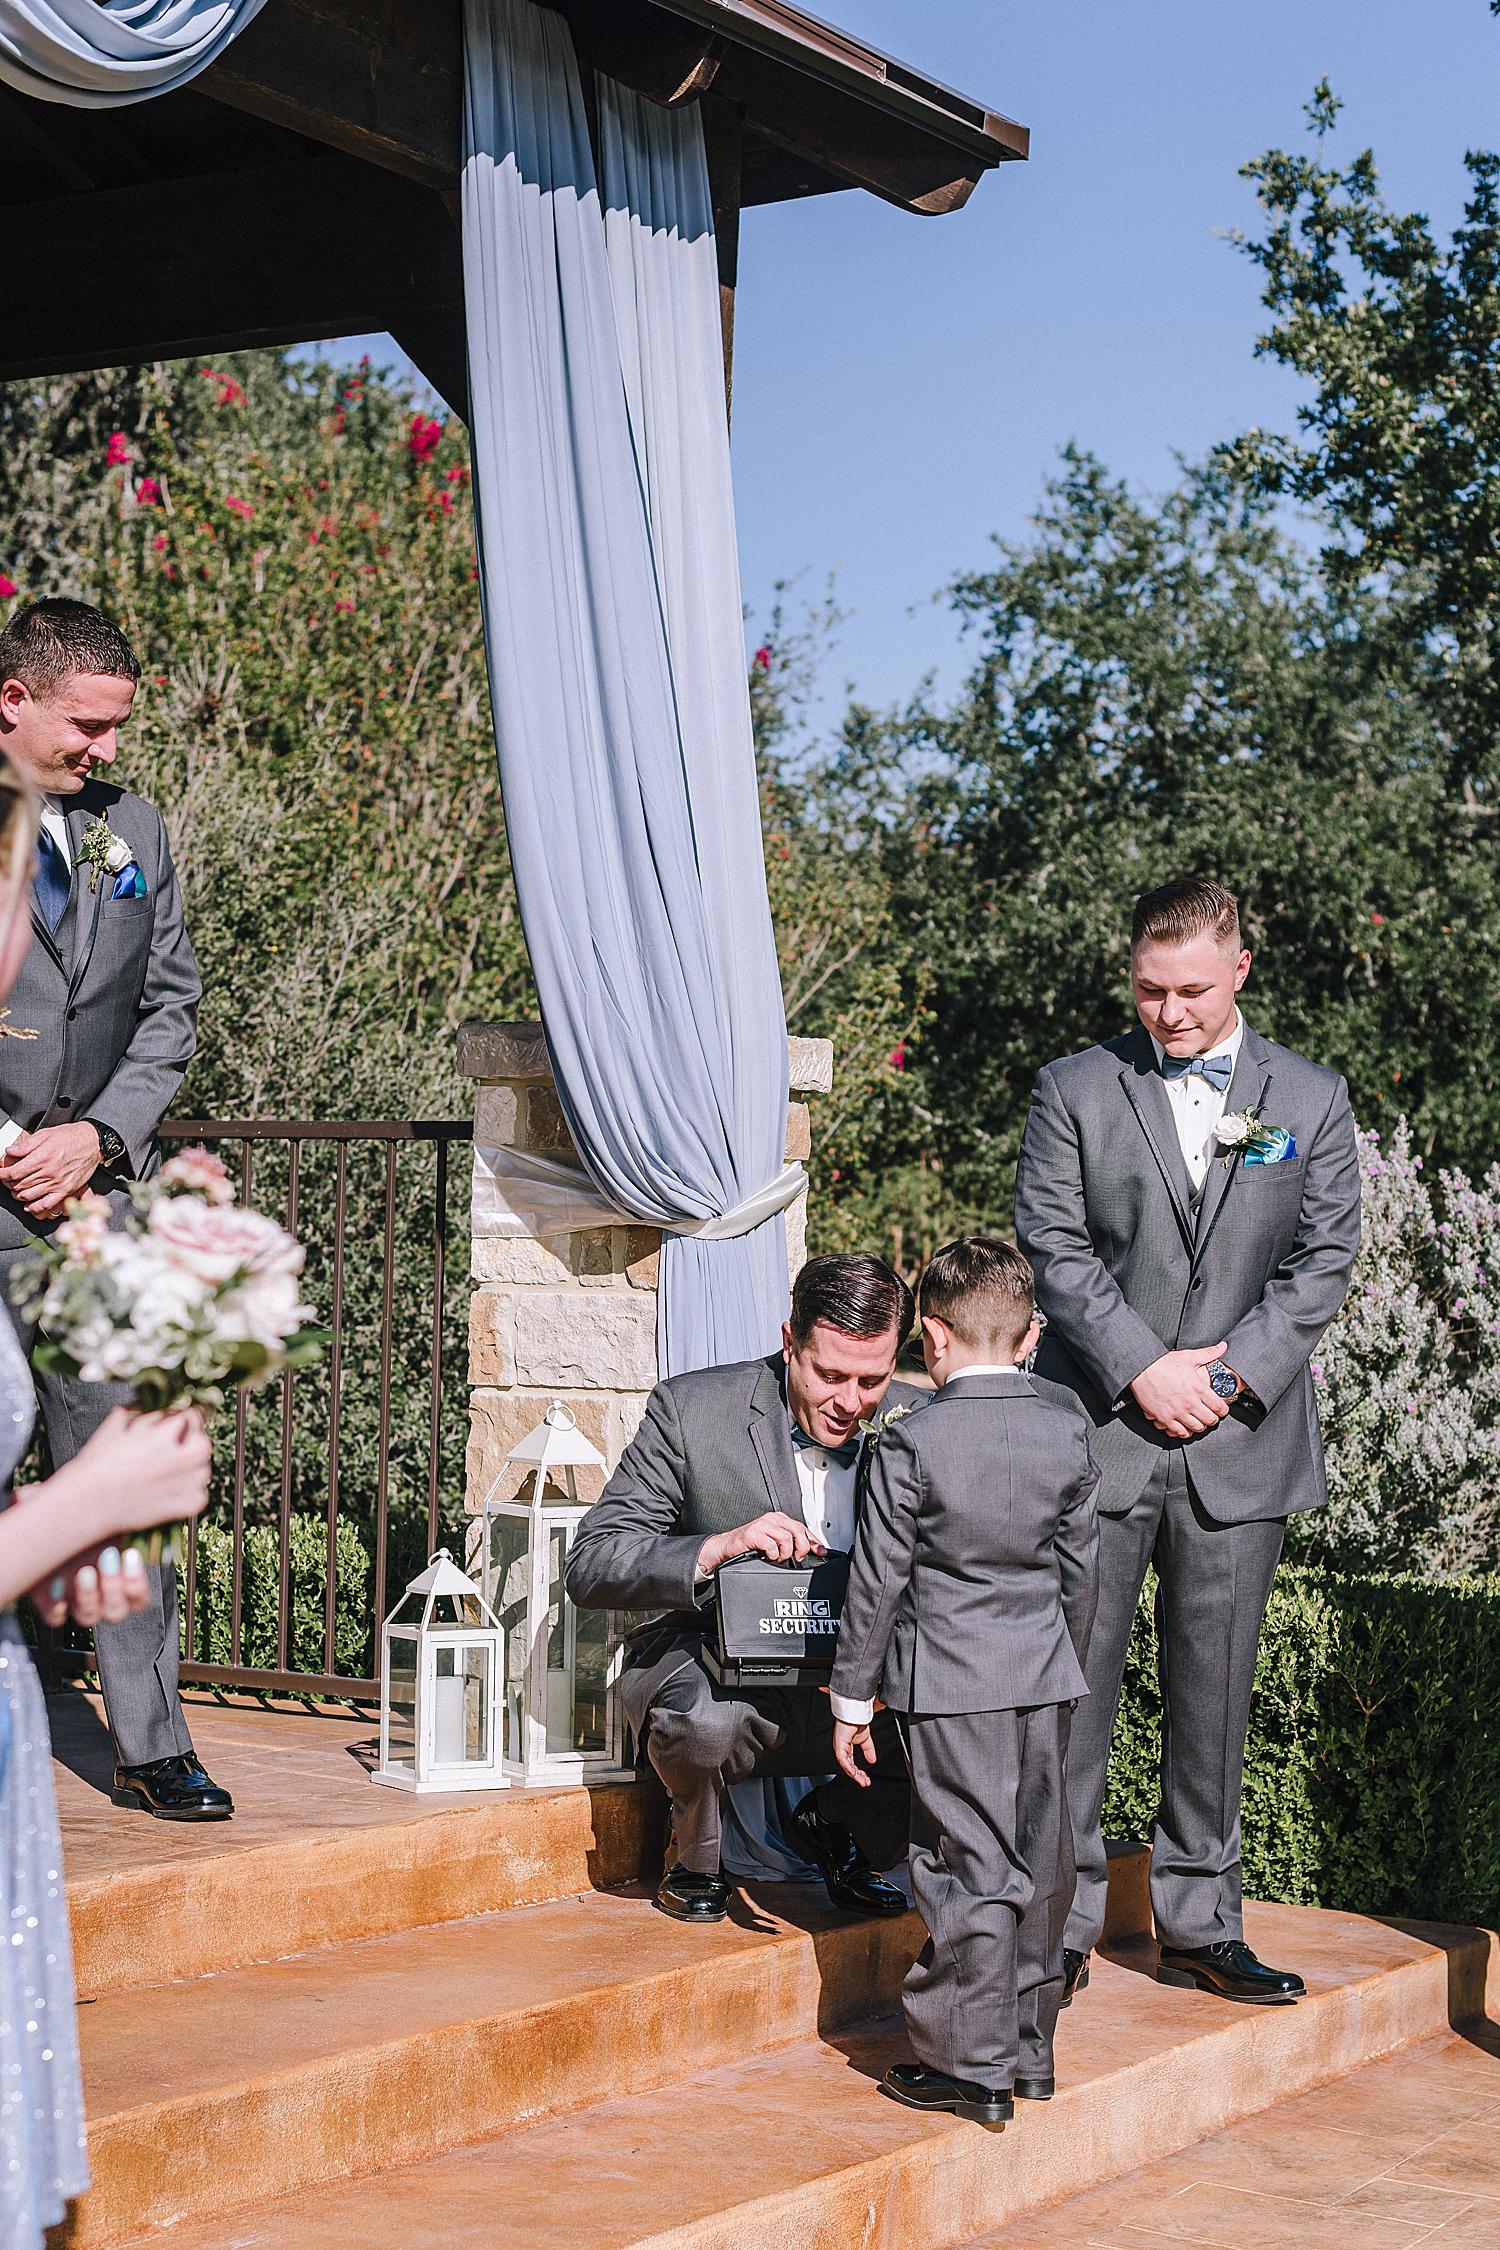 The-Club-at-Garden-Ridge-Military-Wedding-Carly-Barton-Photography_0068.jpg